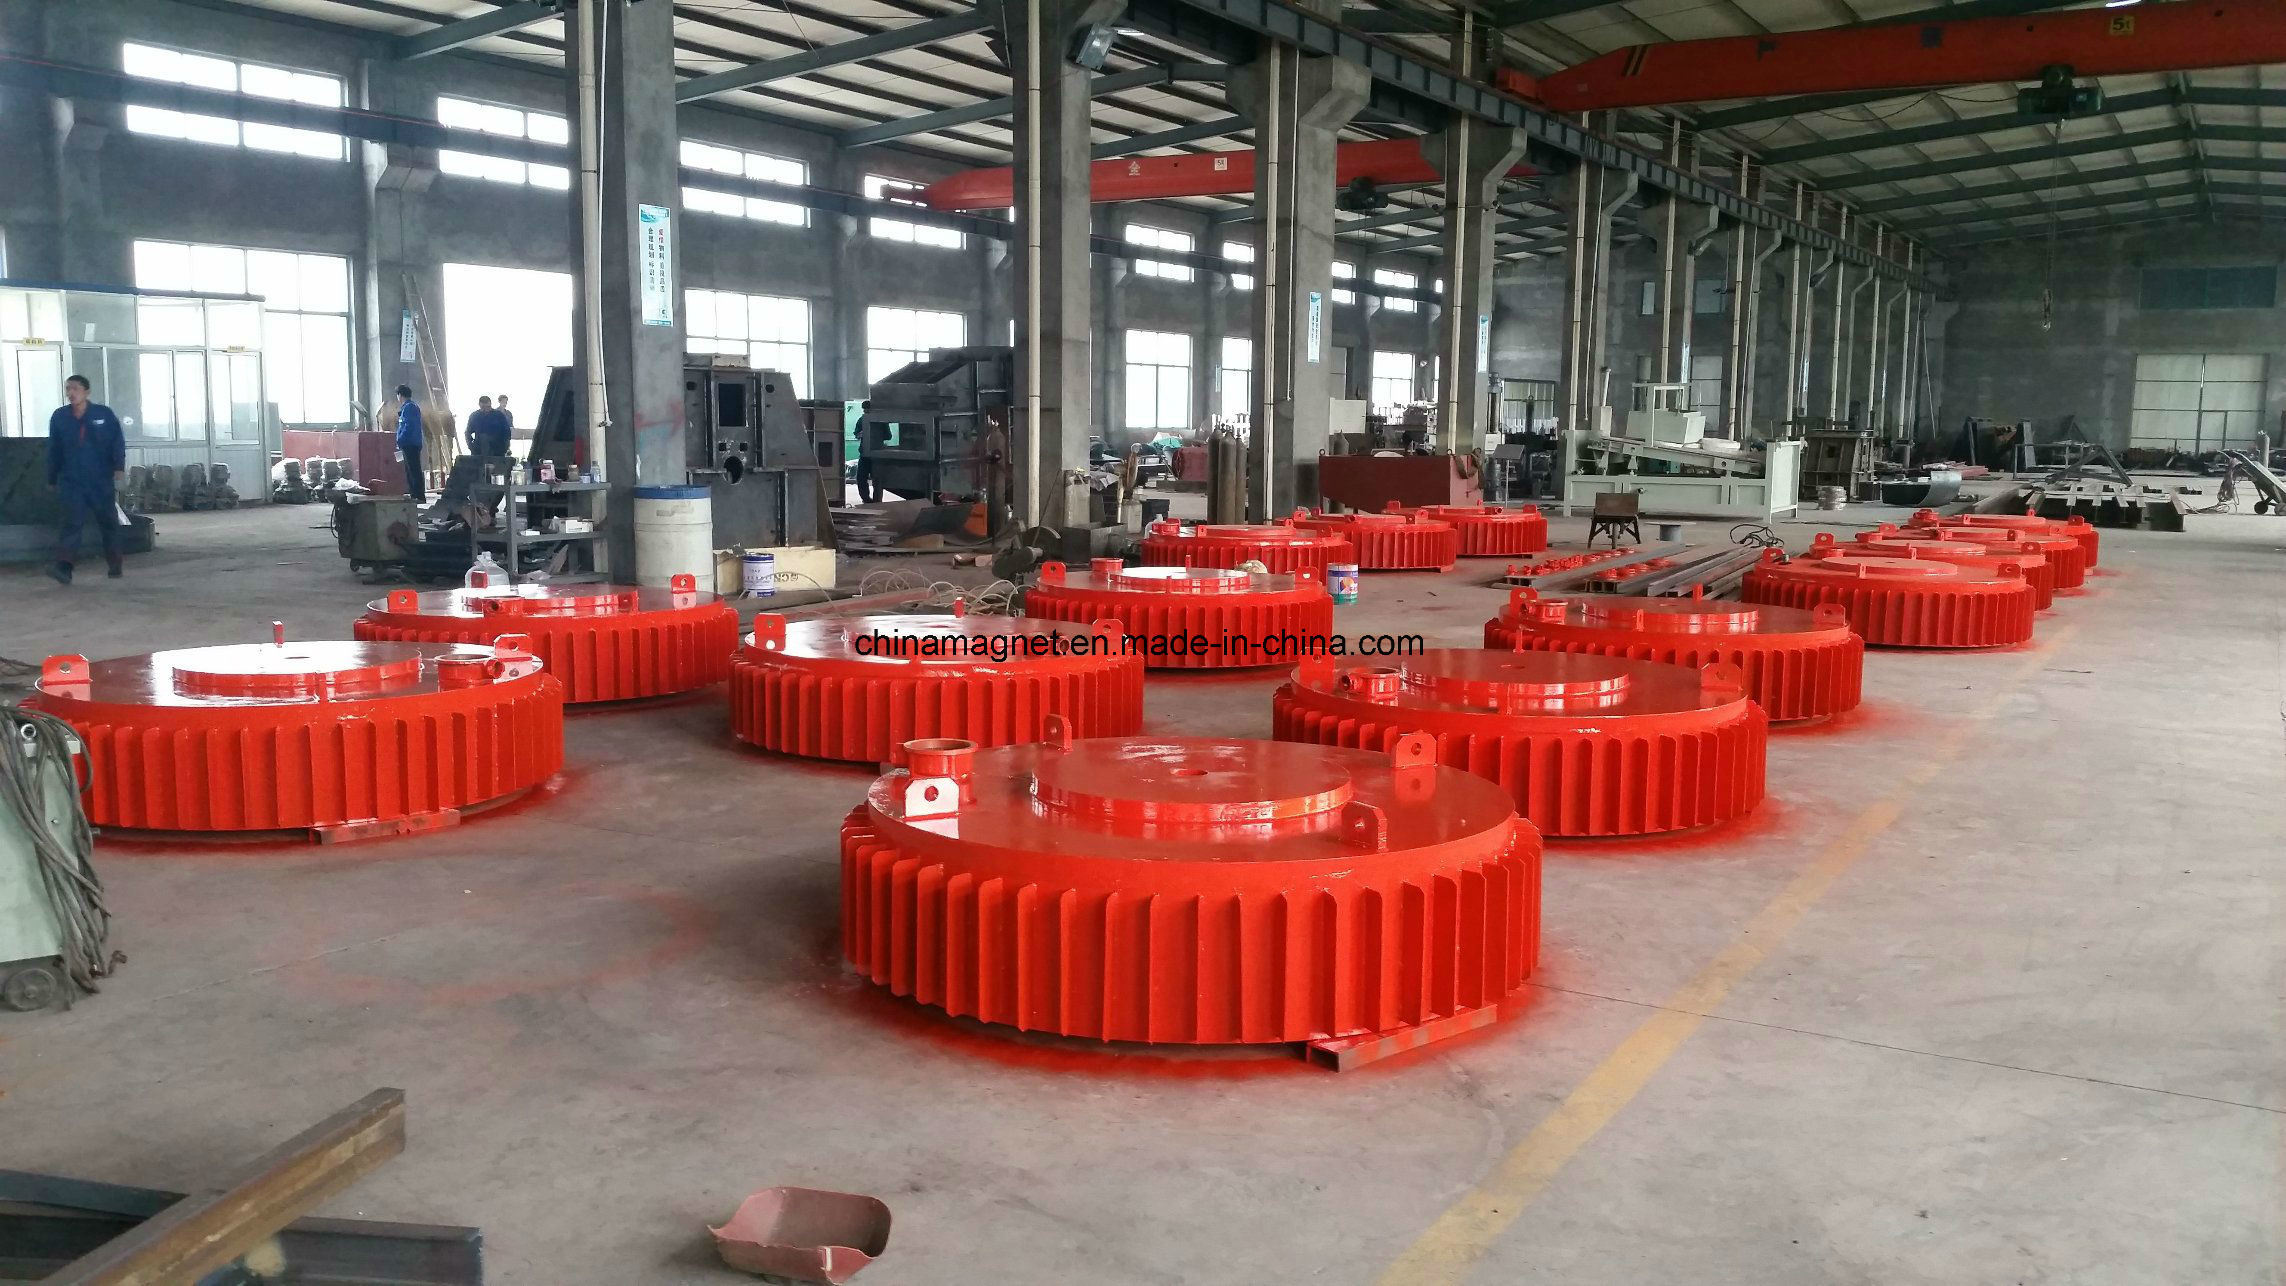 Rcdb Series Suspension High Intensity Permanent Magnetic Separator for Conveyor Belt